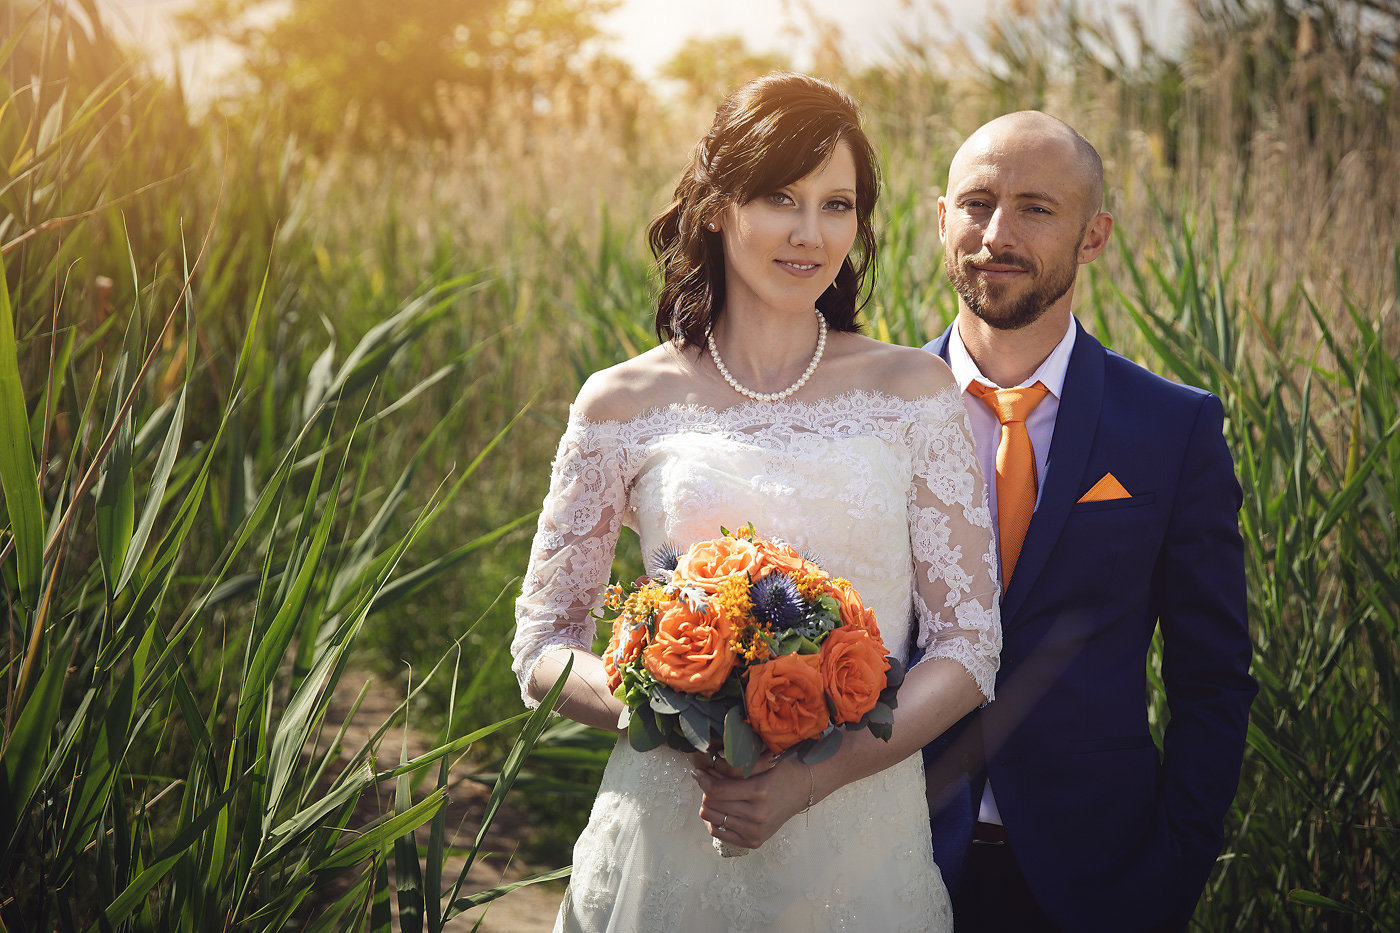 Hochzeitsfotograf Rust| Thomas.Baucek.Photography